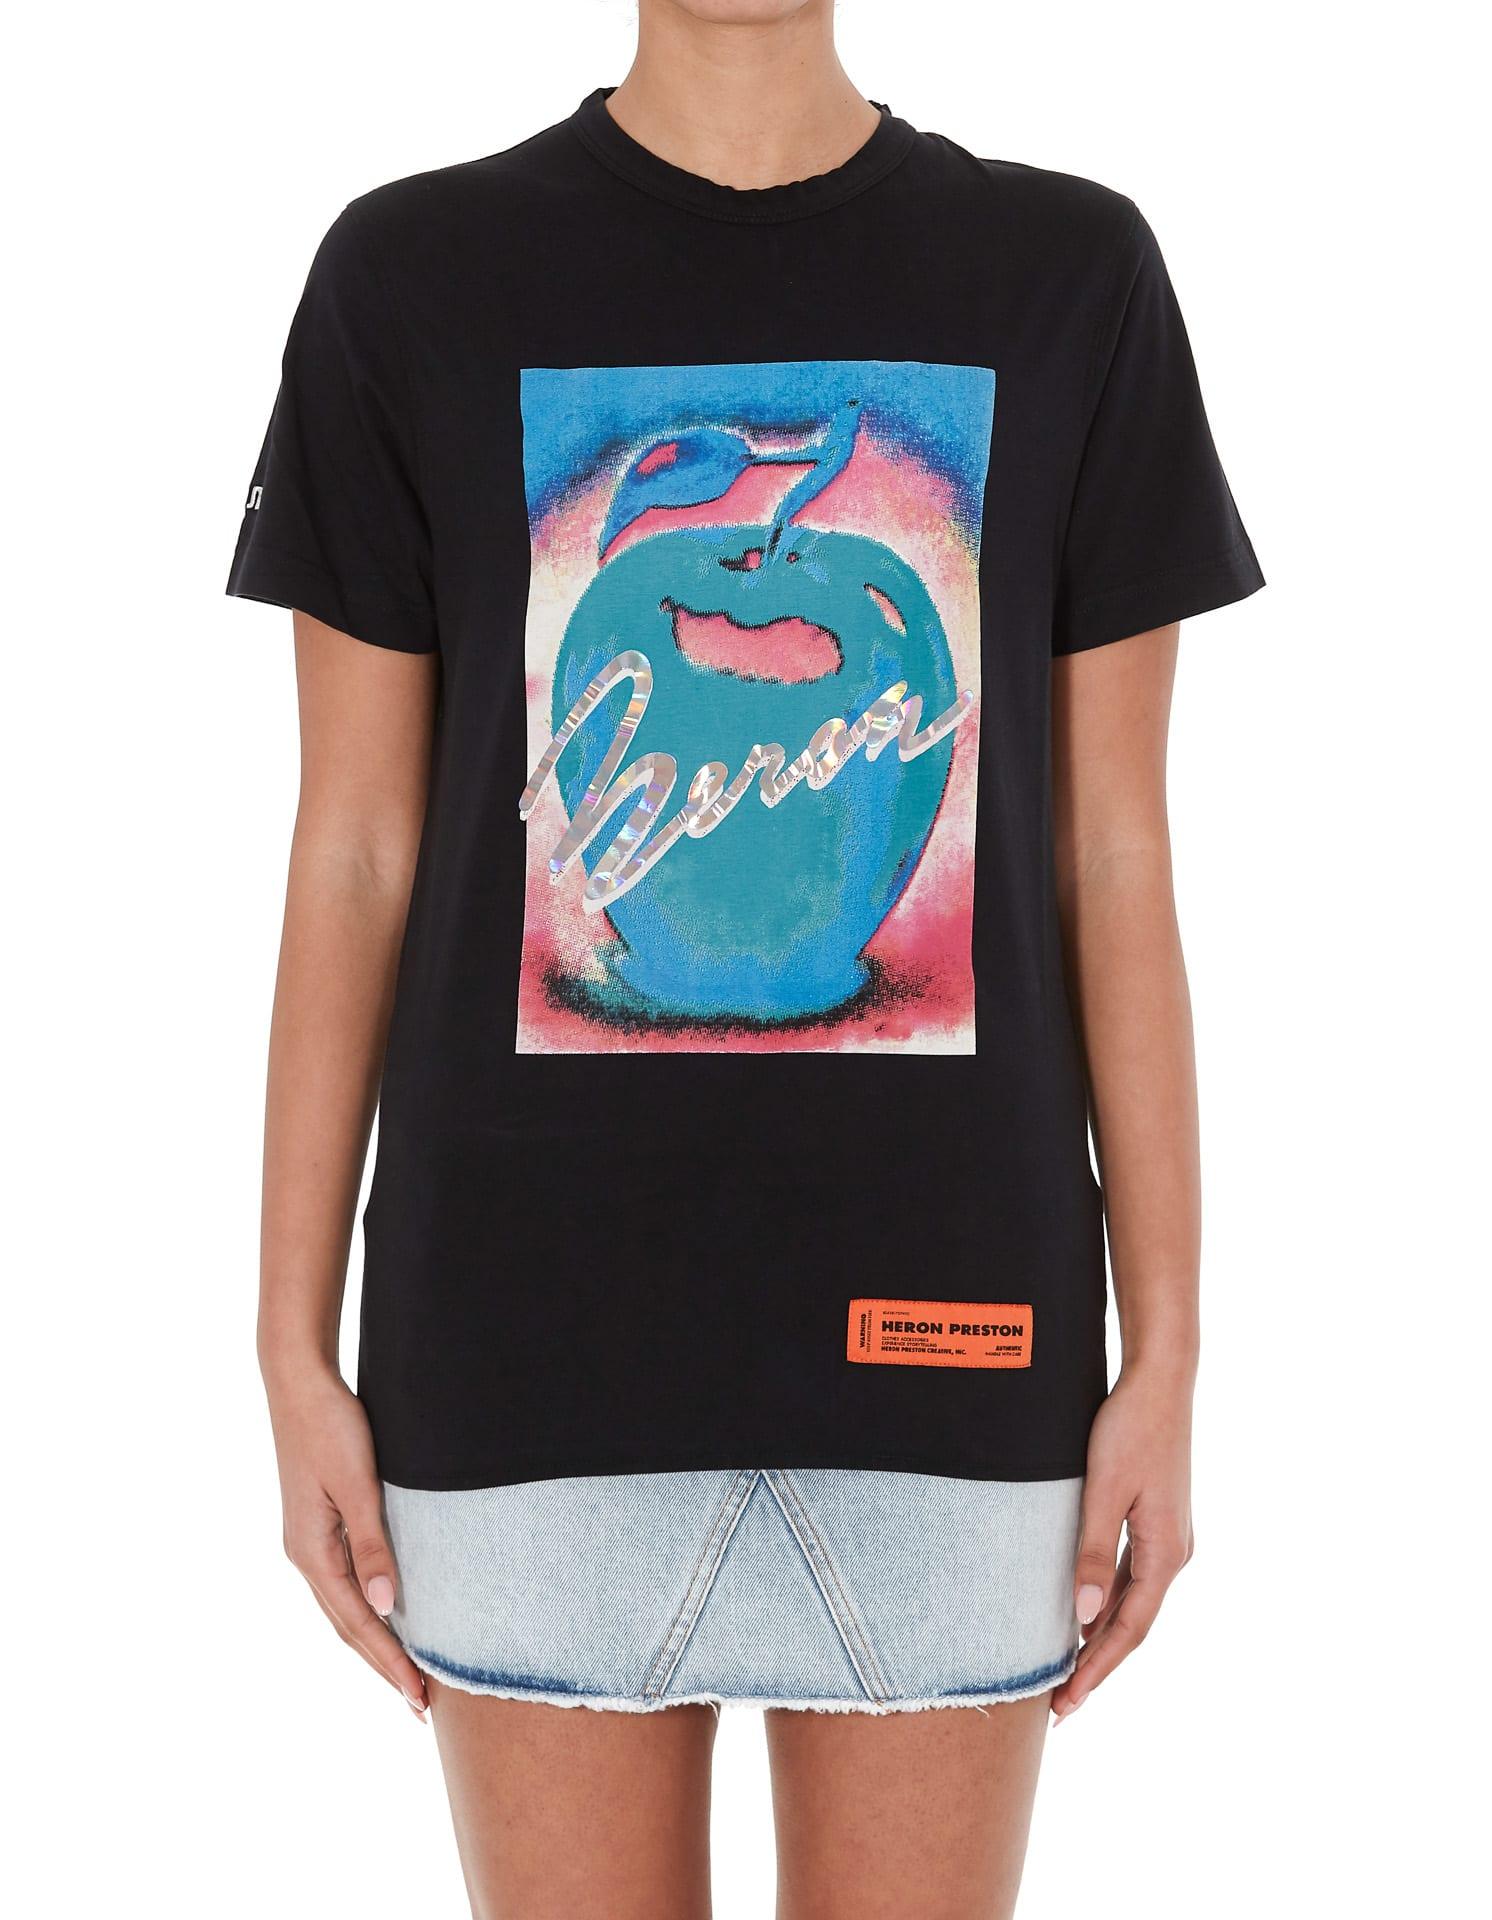 Apple Graphy Tshirt